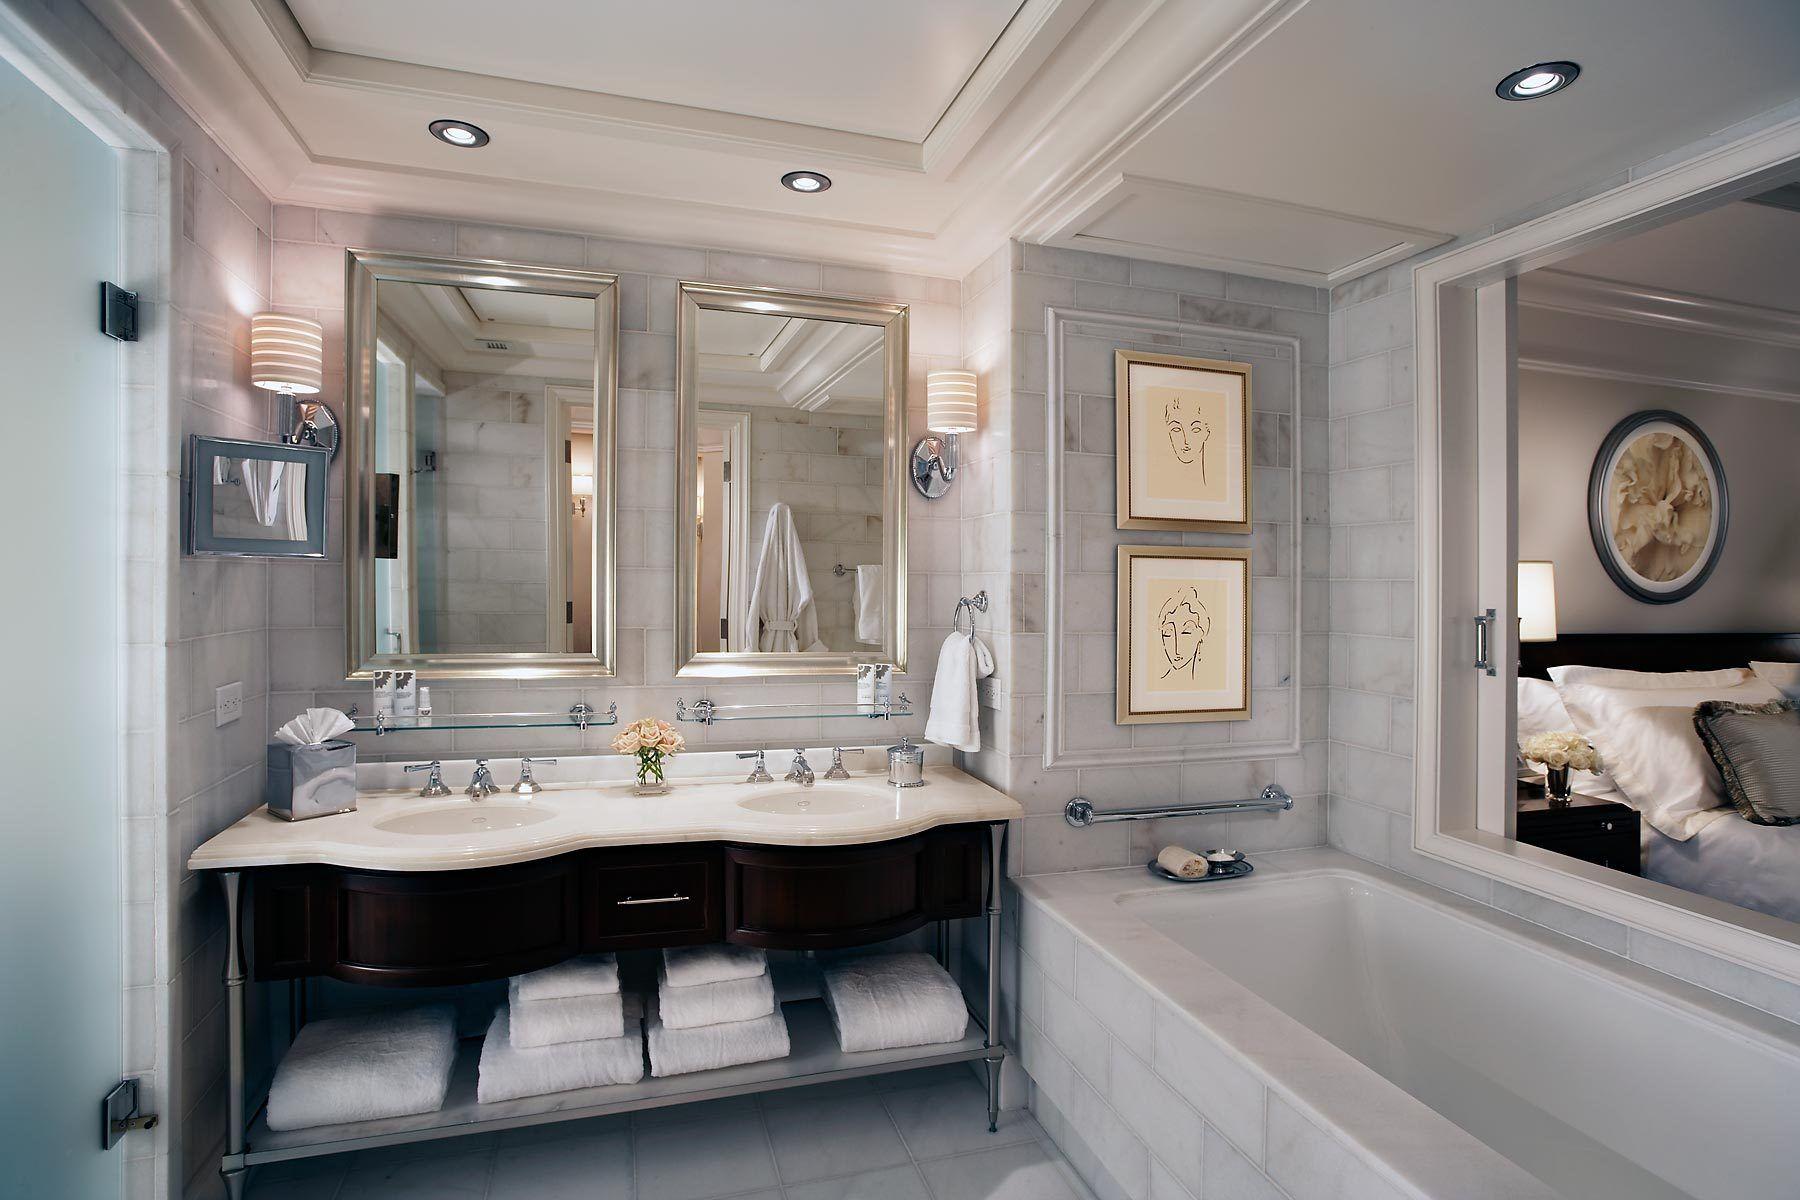 1st_regis_bathroom_a.jpg